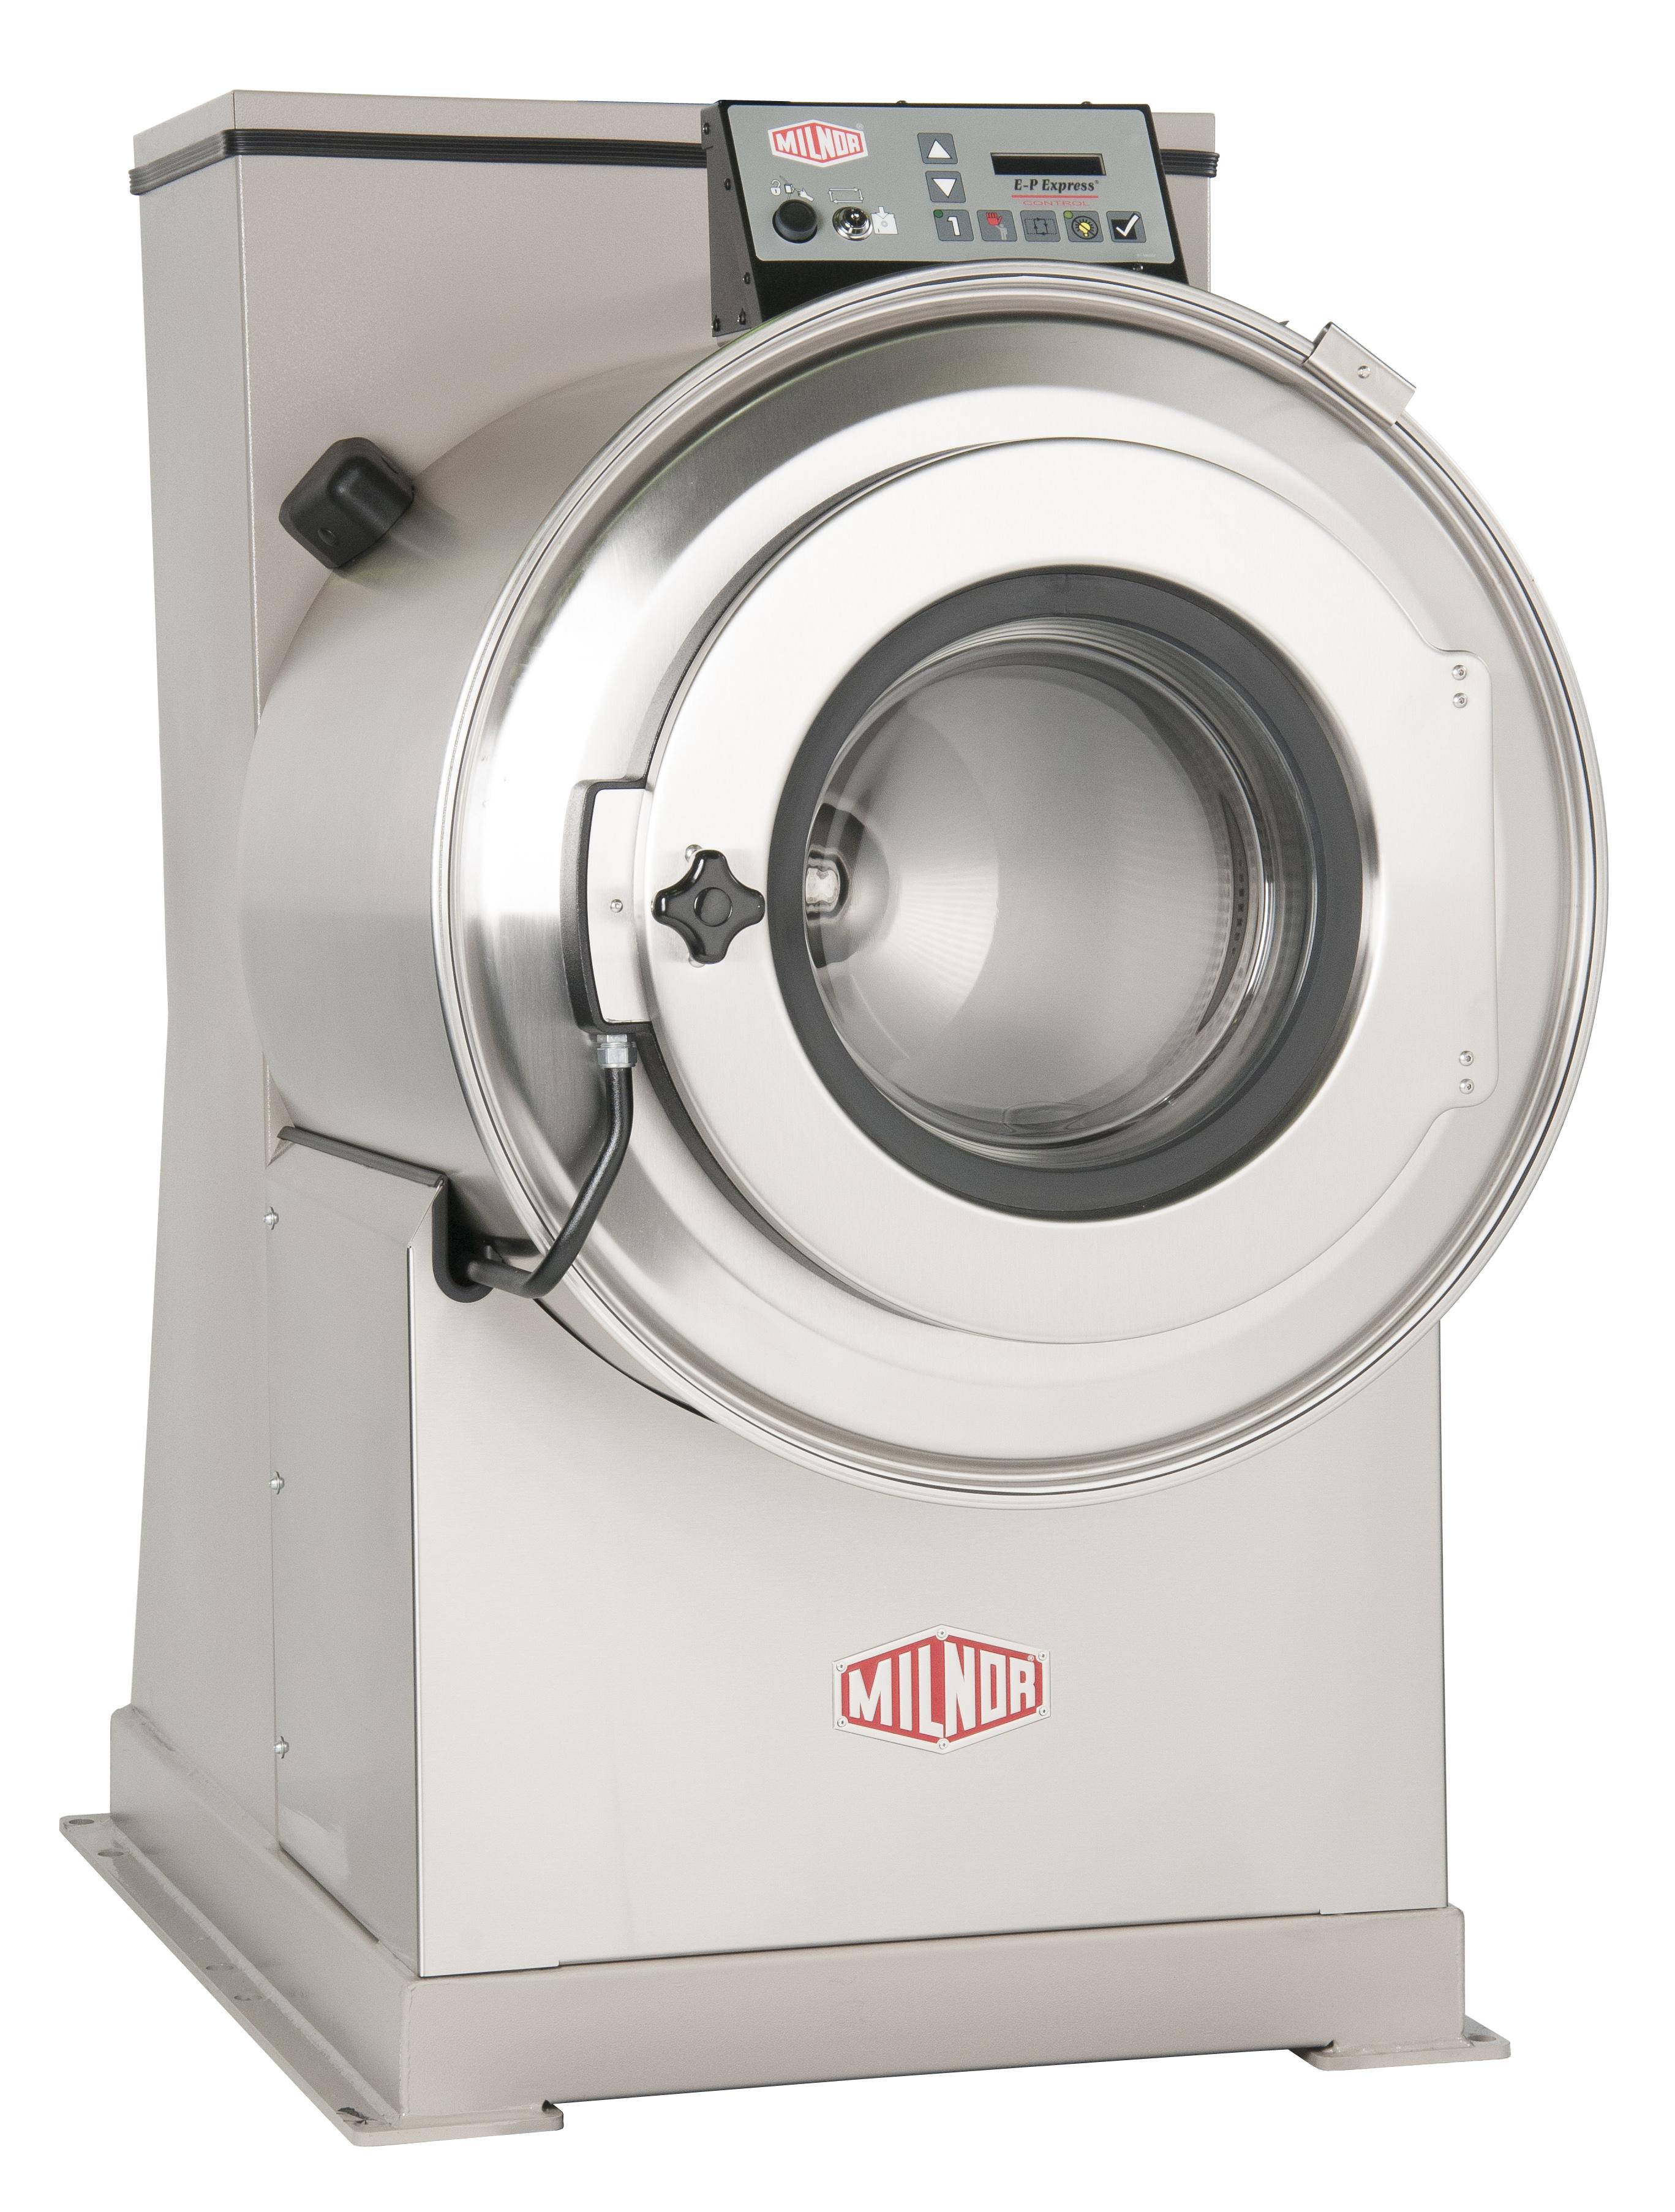 Milnor Washer Extractor Parts ~ T pellerin milnor corporation